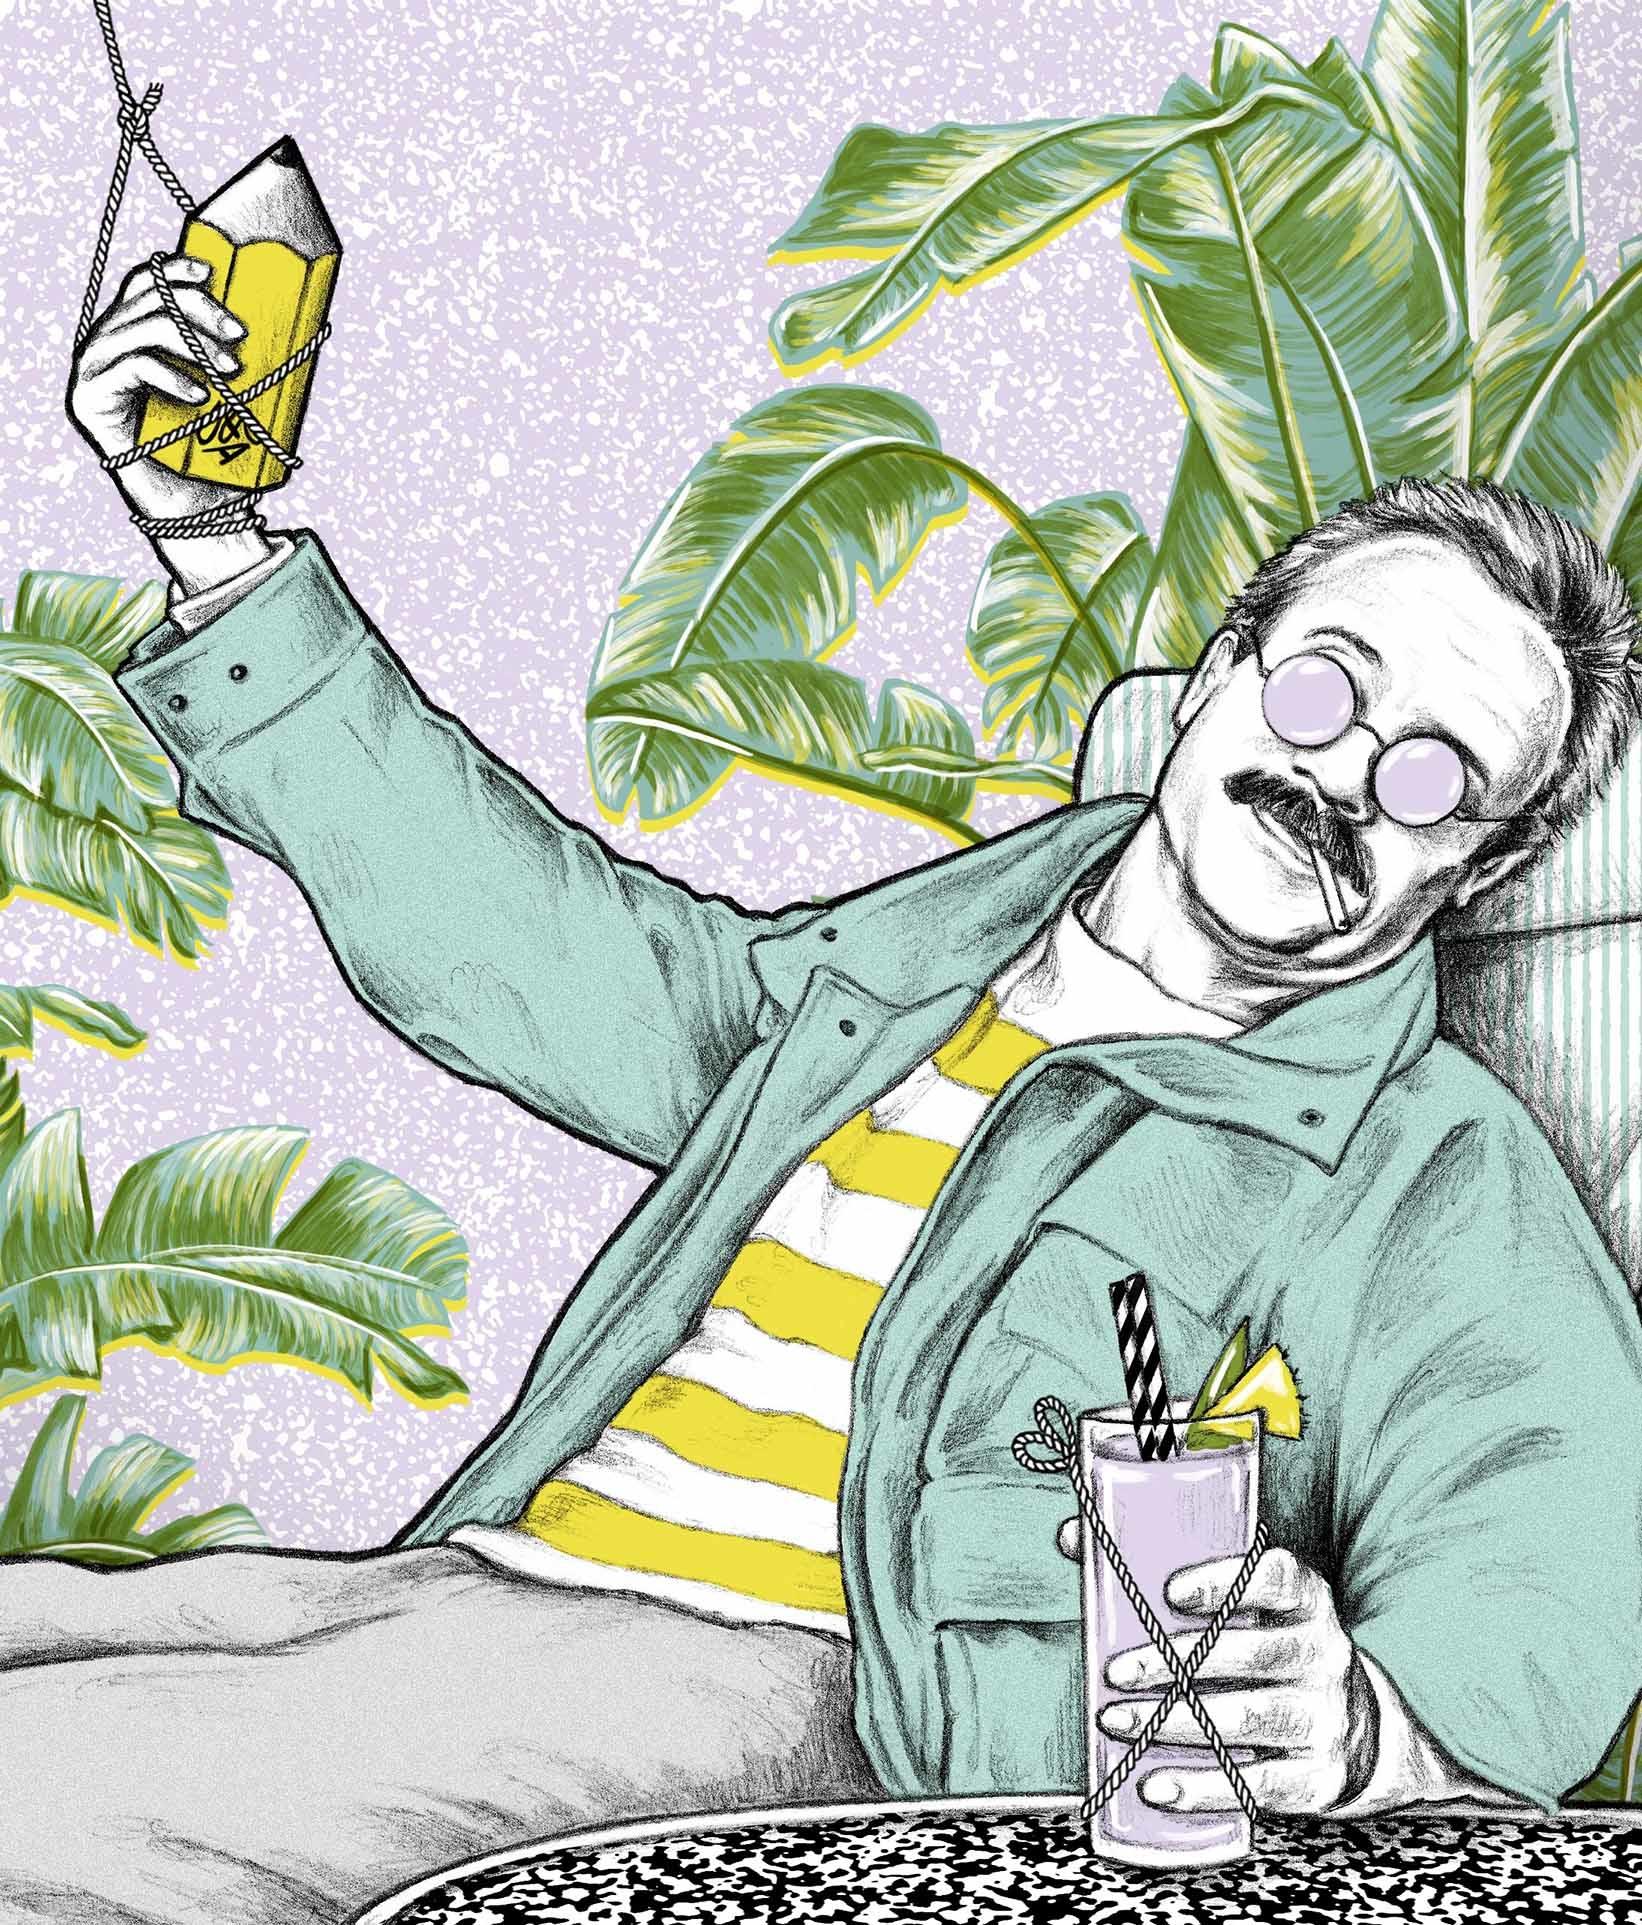 Creative-Review-Ben-Kay-column-editorial-weekend-at-bernie's-1980s-80s-Jennifer-Dionisio-prints-illustration-illustrator-artwork.jpg